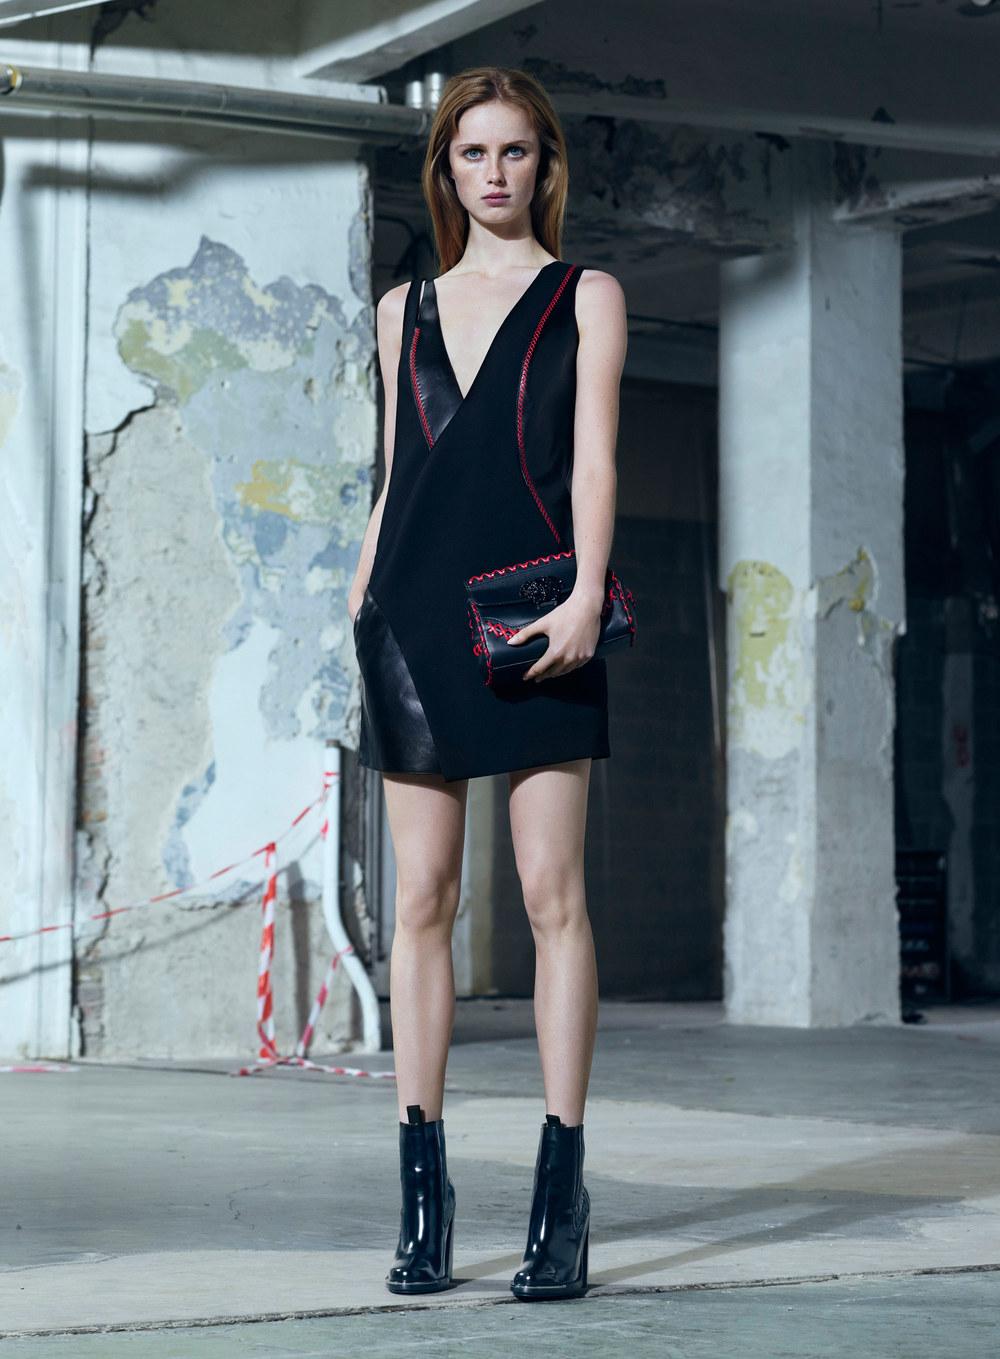 versace-pre-fall-2016-lookbook-23.jpg